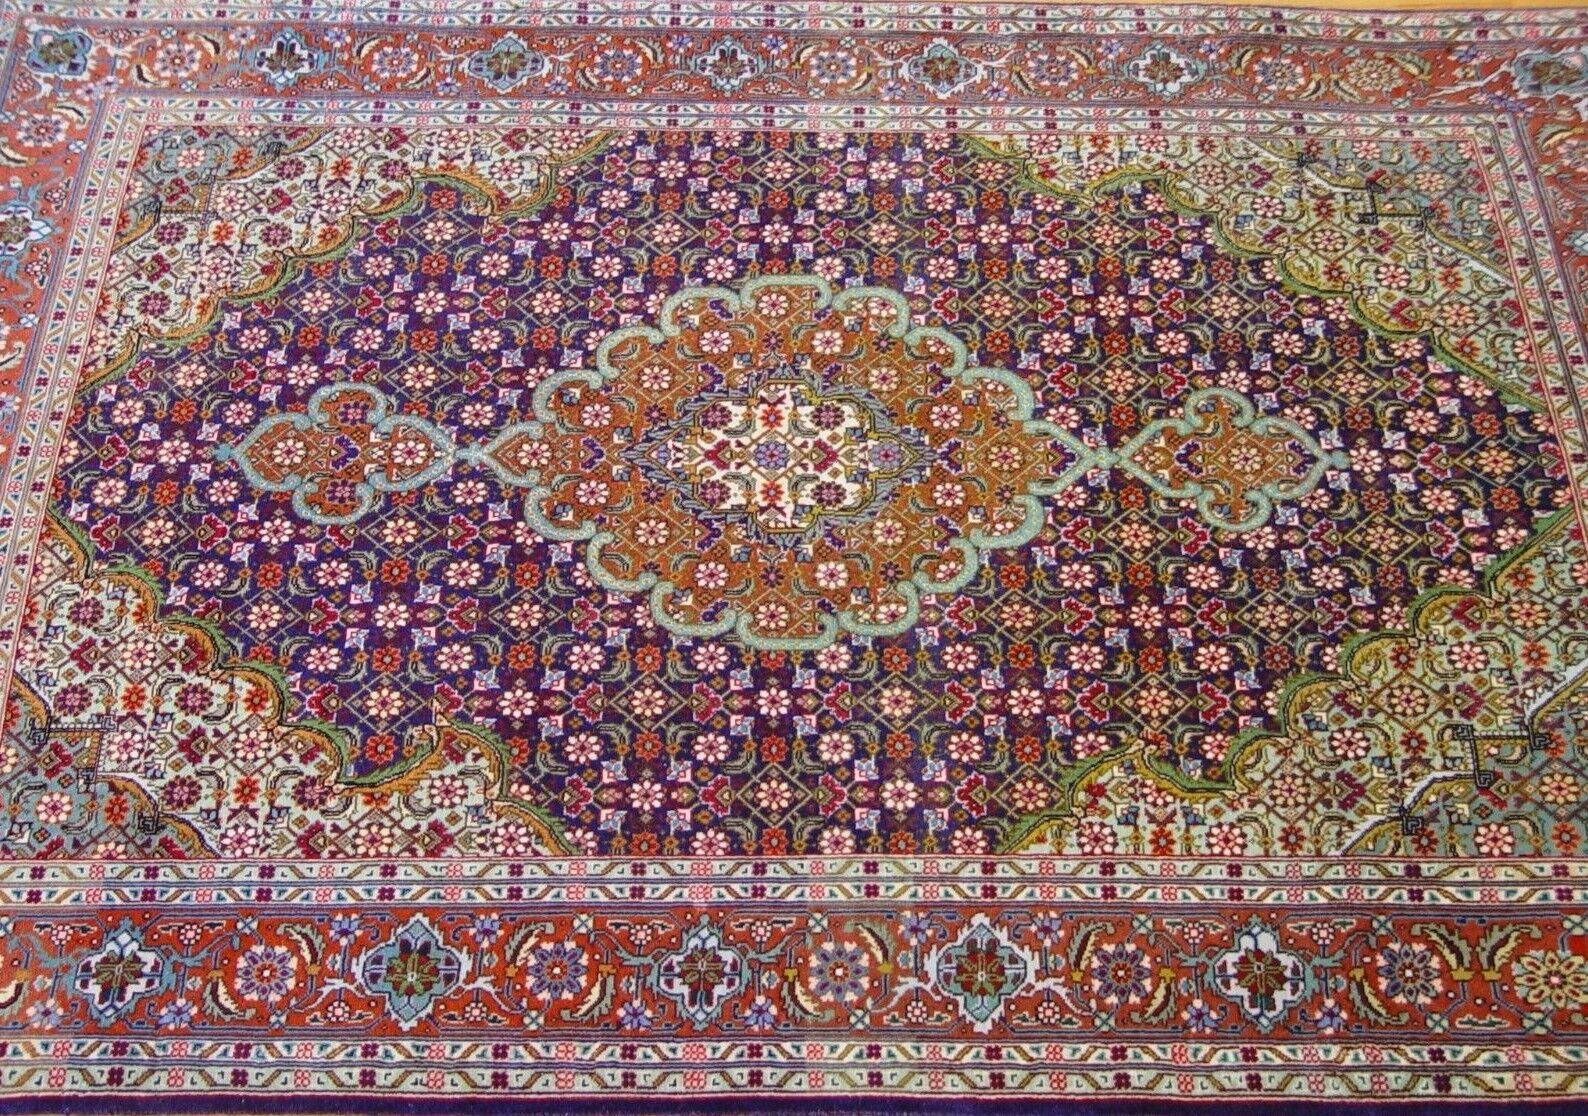 3'2 3'2 3'2  x 4'6  Premium Quality Vintage Tebriz Hand Made 100% Silk Wool Oriental Rug 91736b